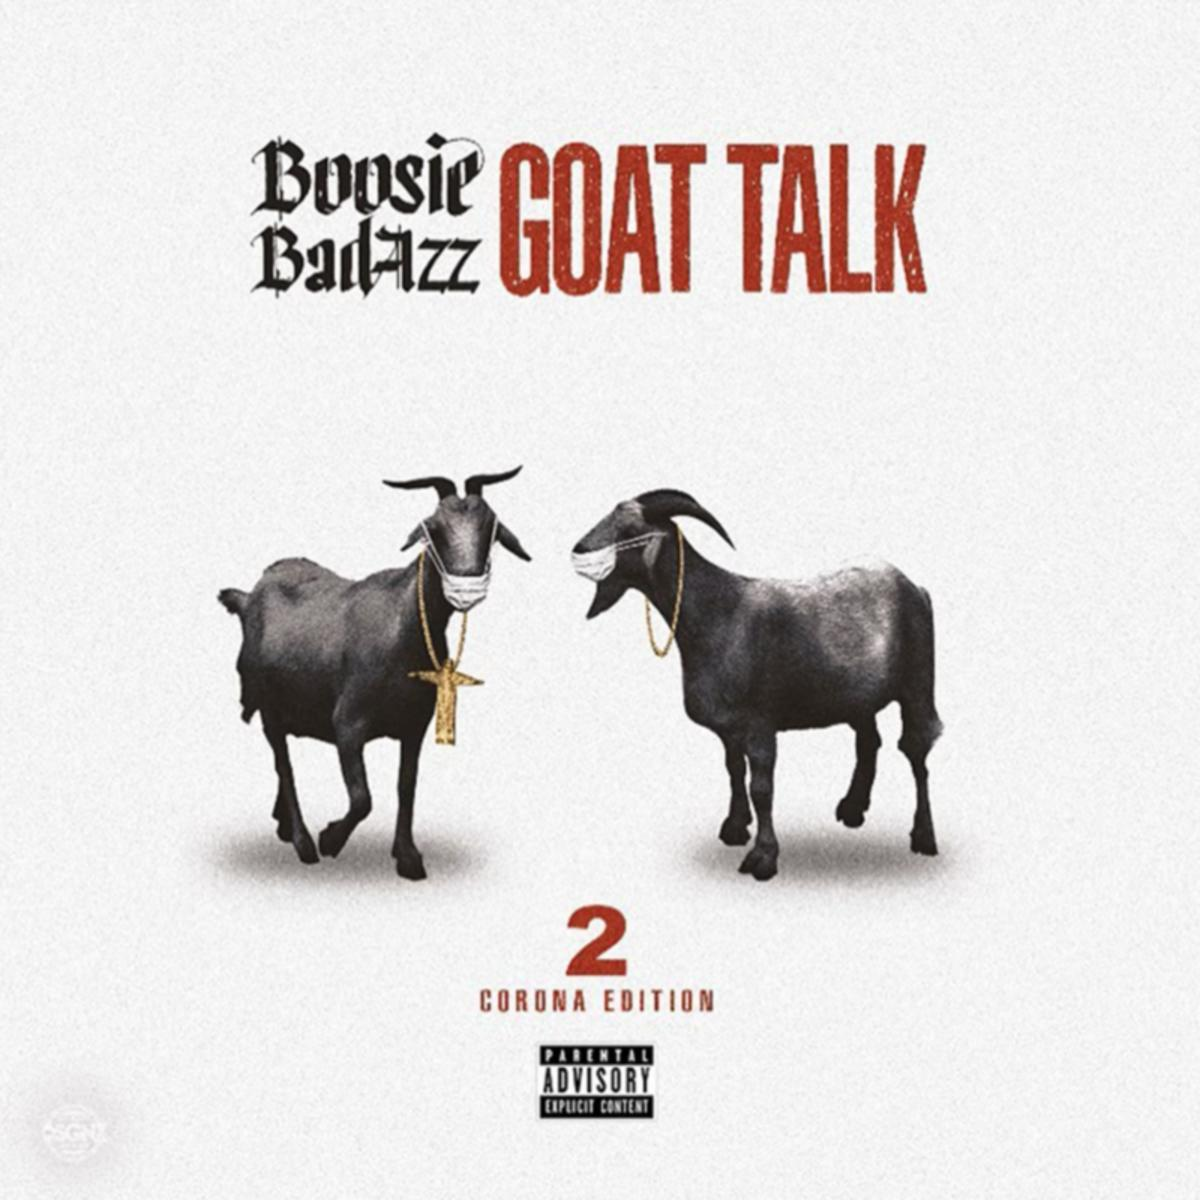 DOWNLOAD ZIP Boosie Badazz - Goat Talk 2 Album